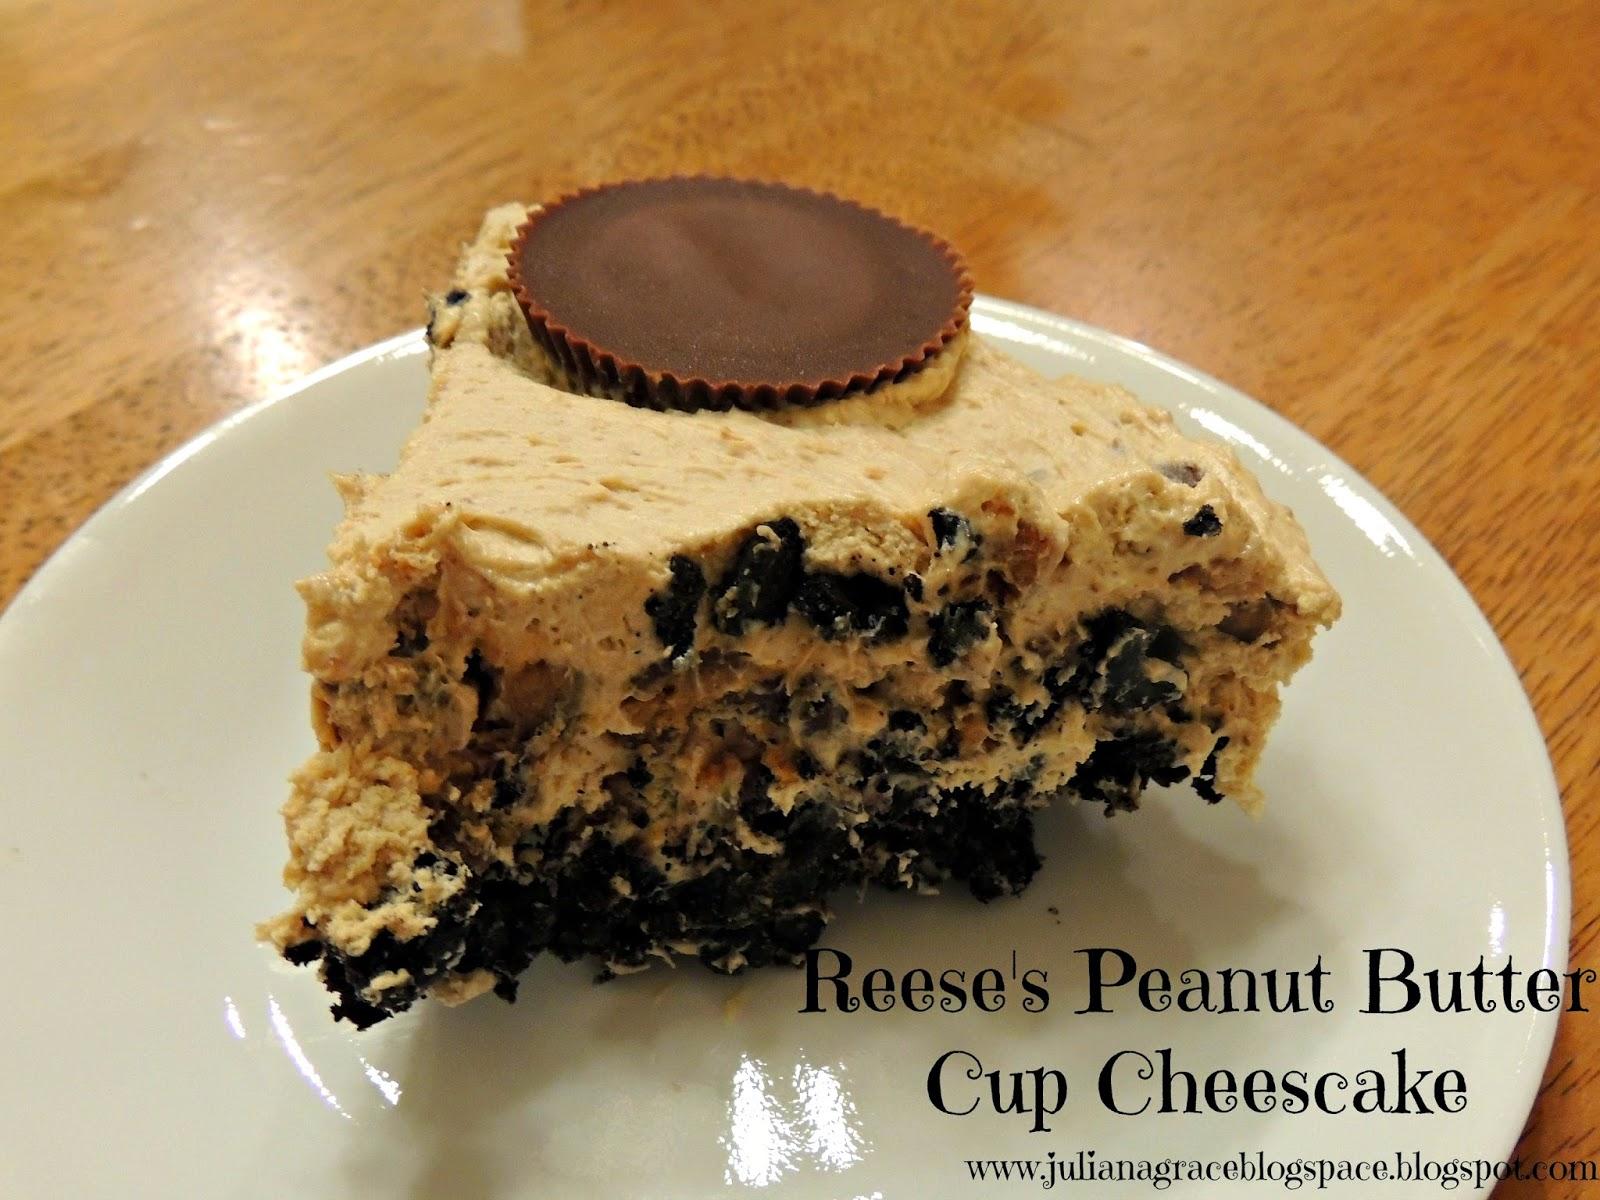 Gluten Free Reese's Peanut Butter Cheesecake Pie